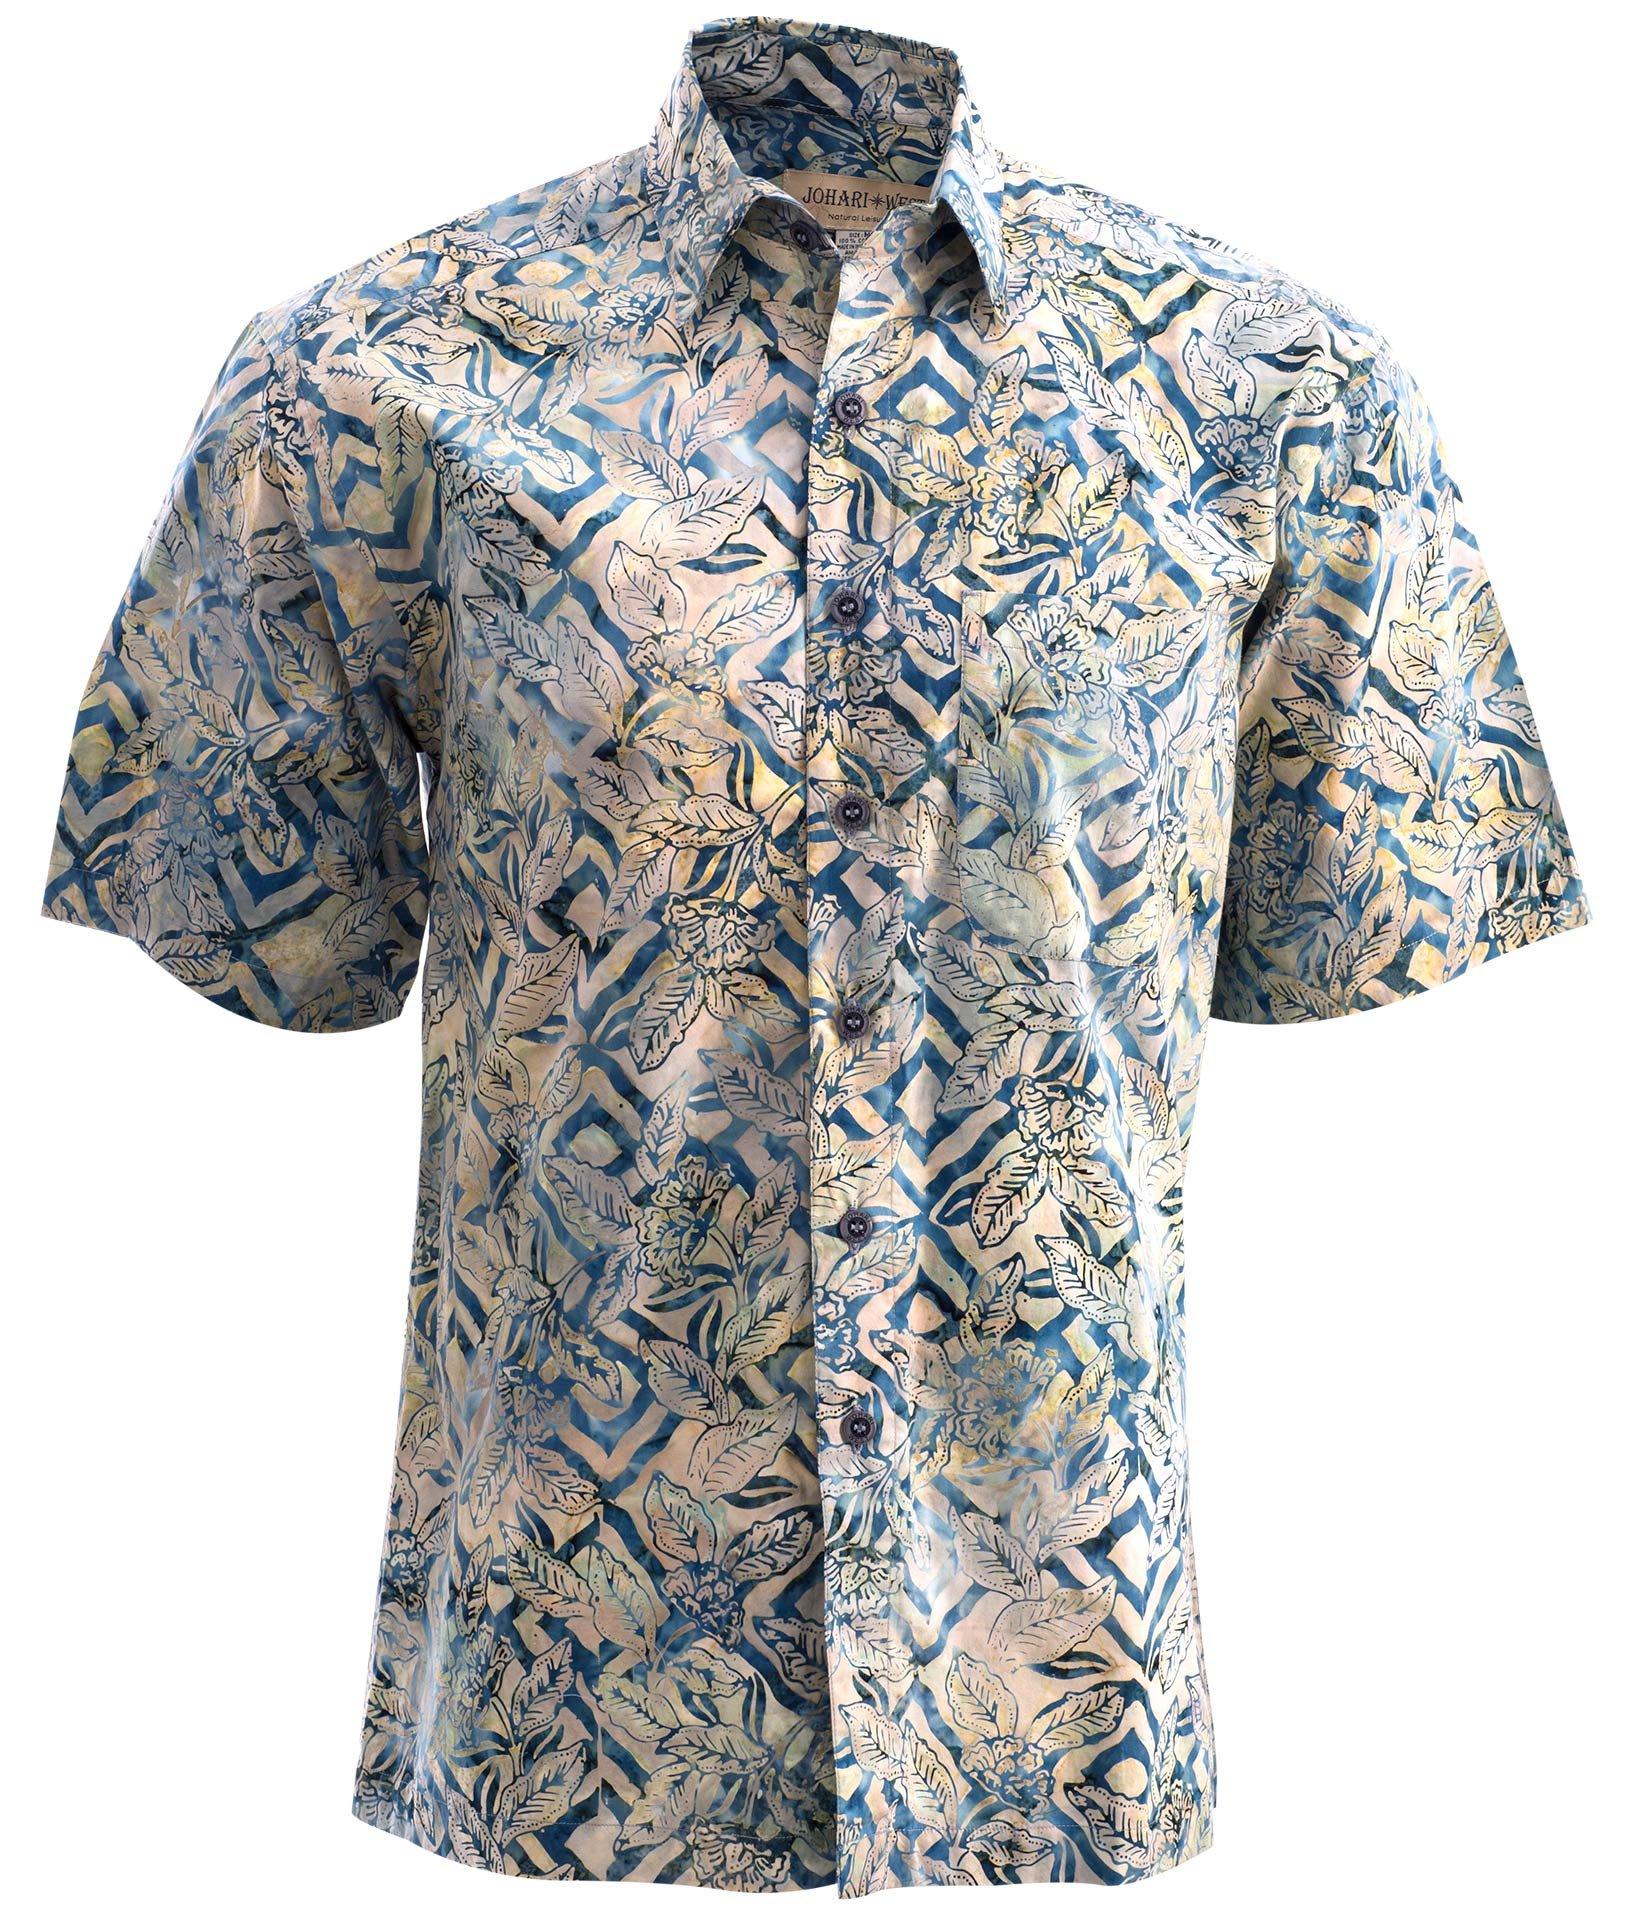 Johari West Jungle Sand Cotton Hawaiian Batik Shirt